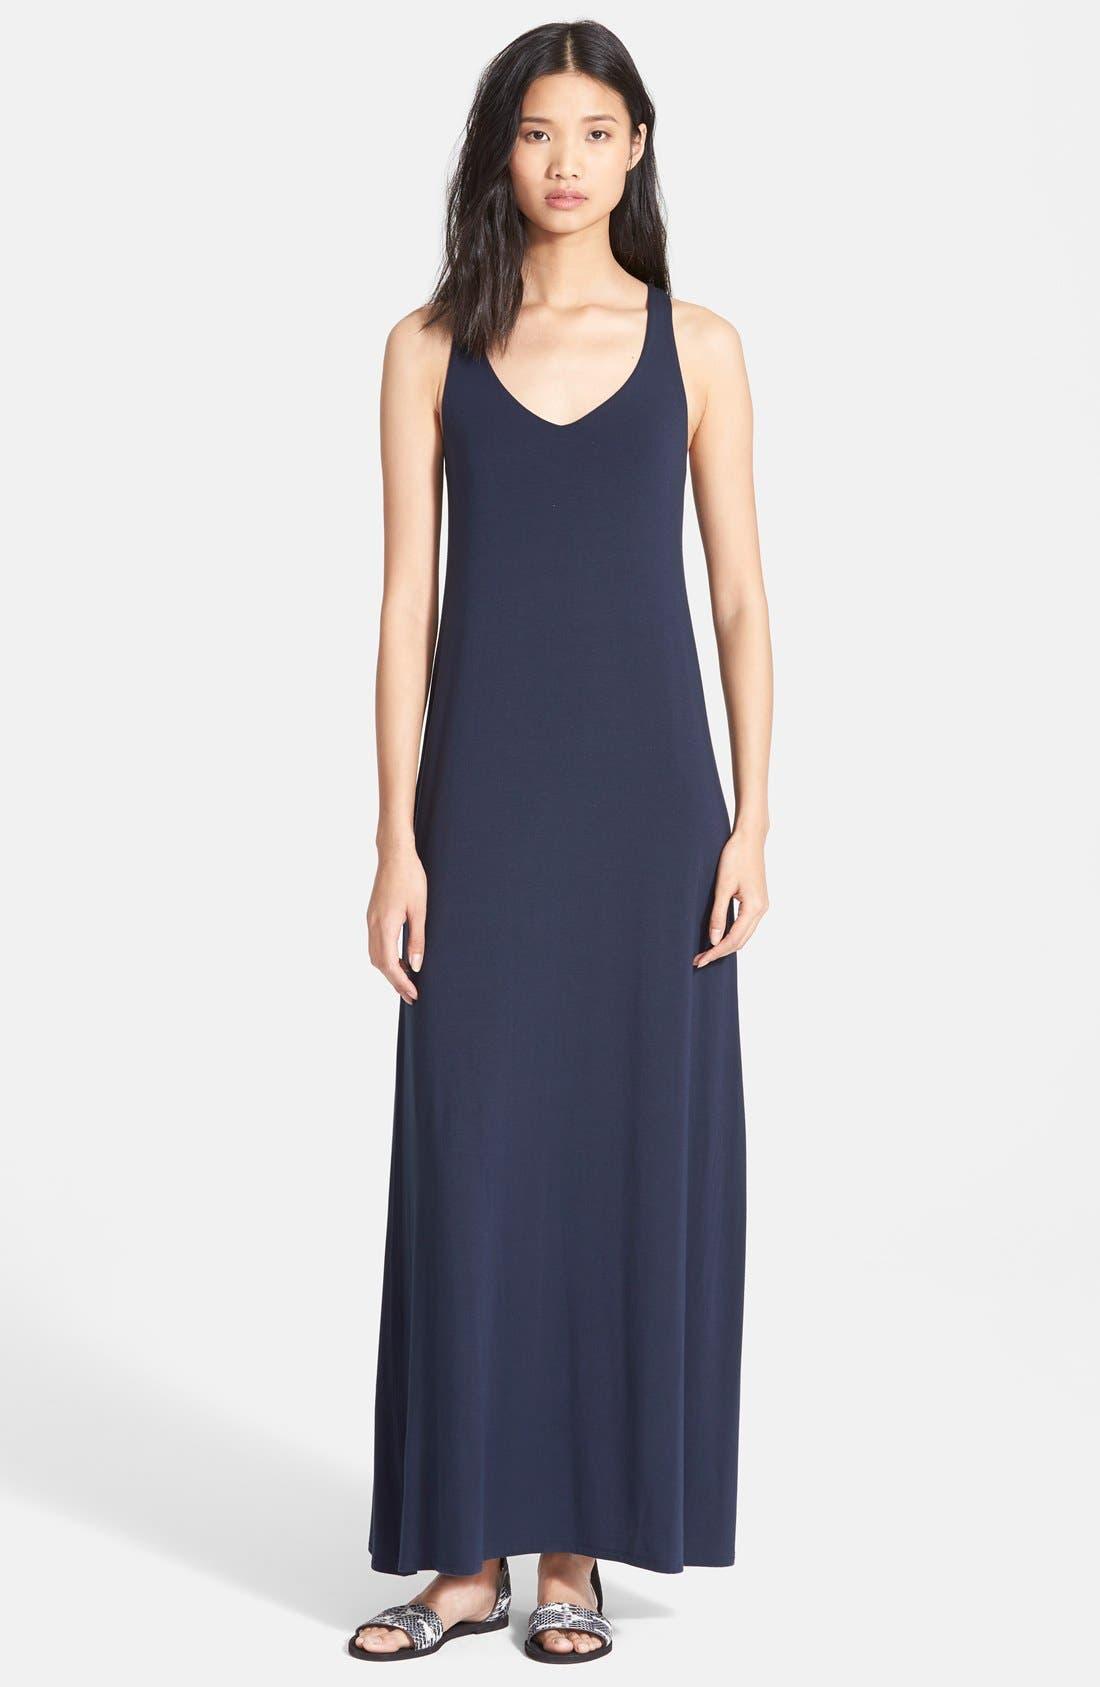 Alternate Image 1 Selected - Vince V-Neck Maxi Dress (Nordstrom Exclusive)